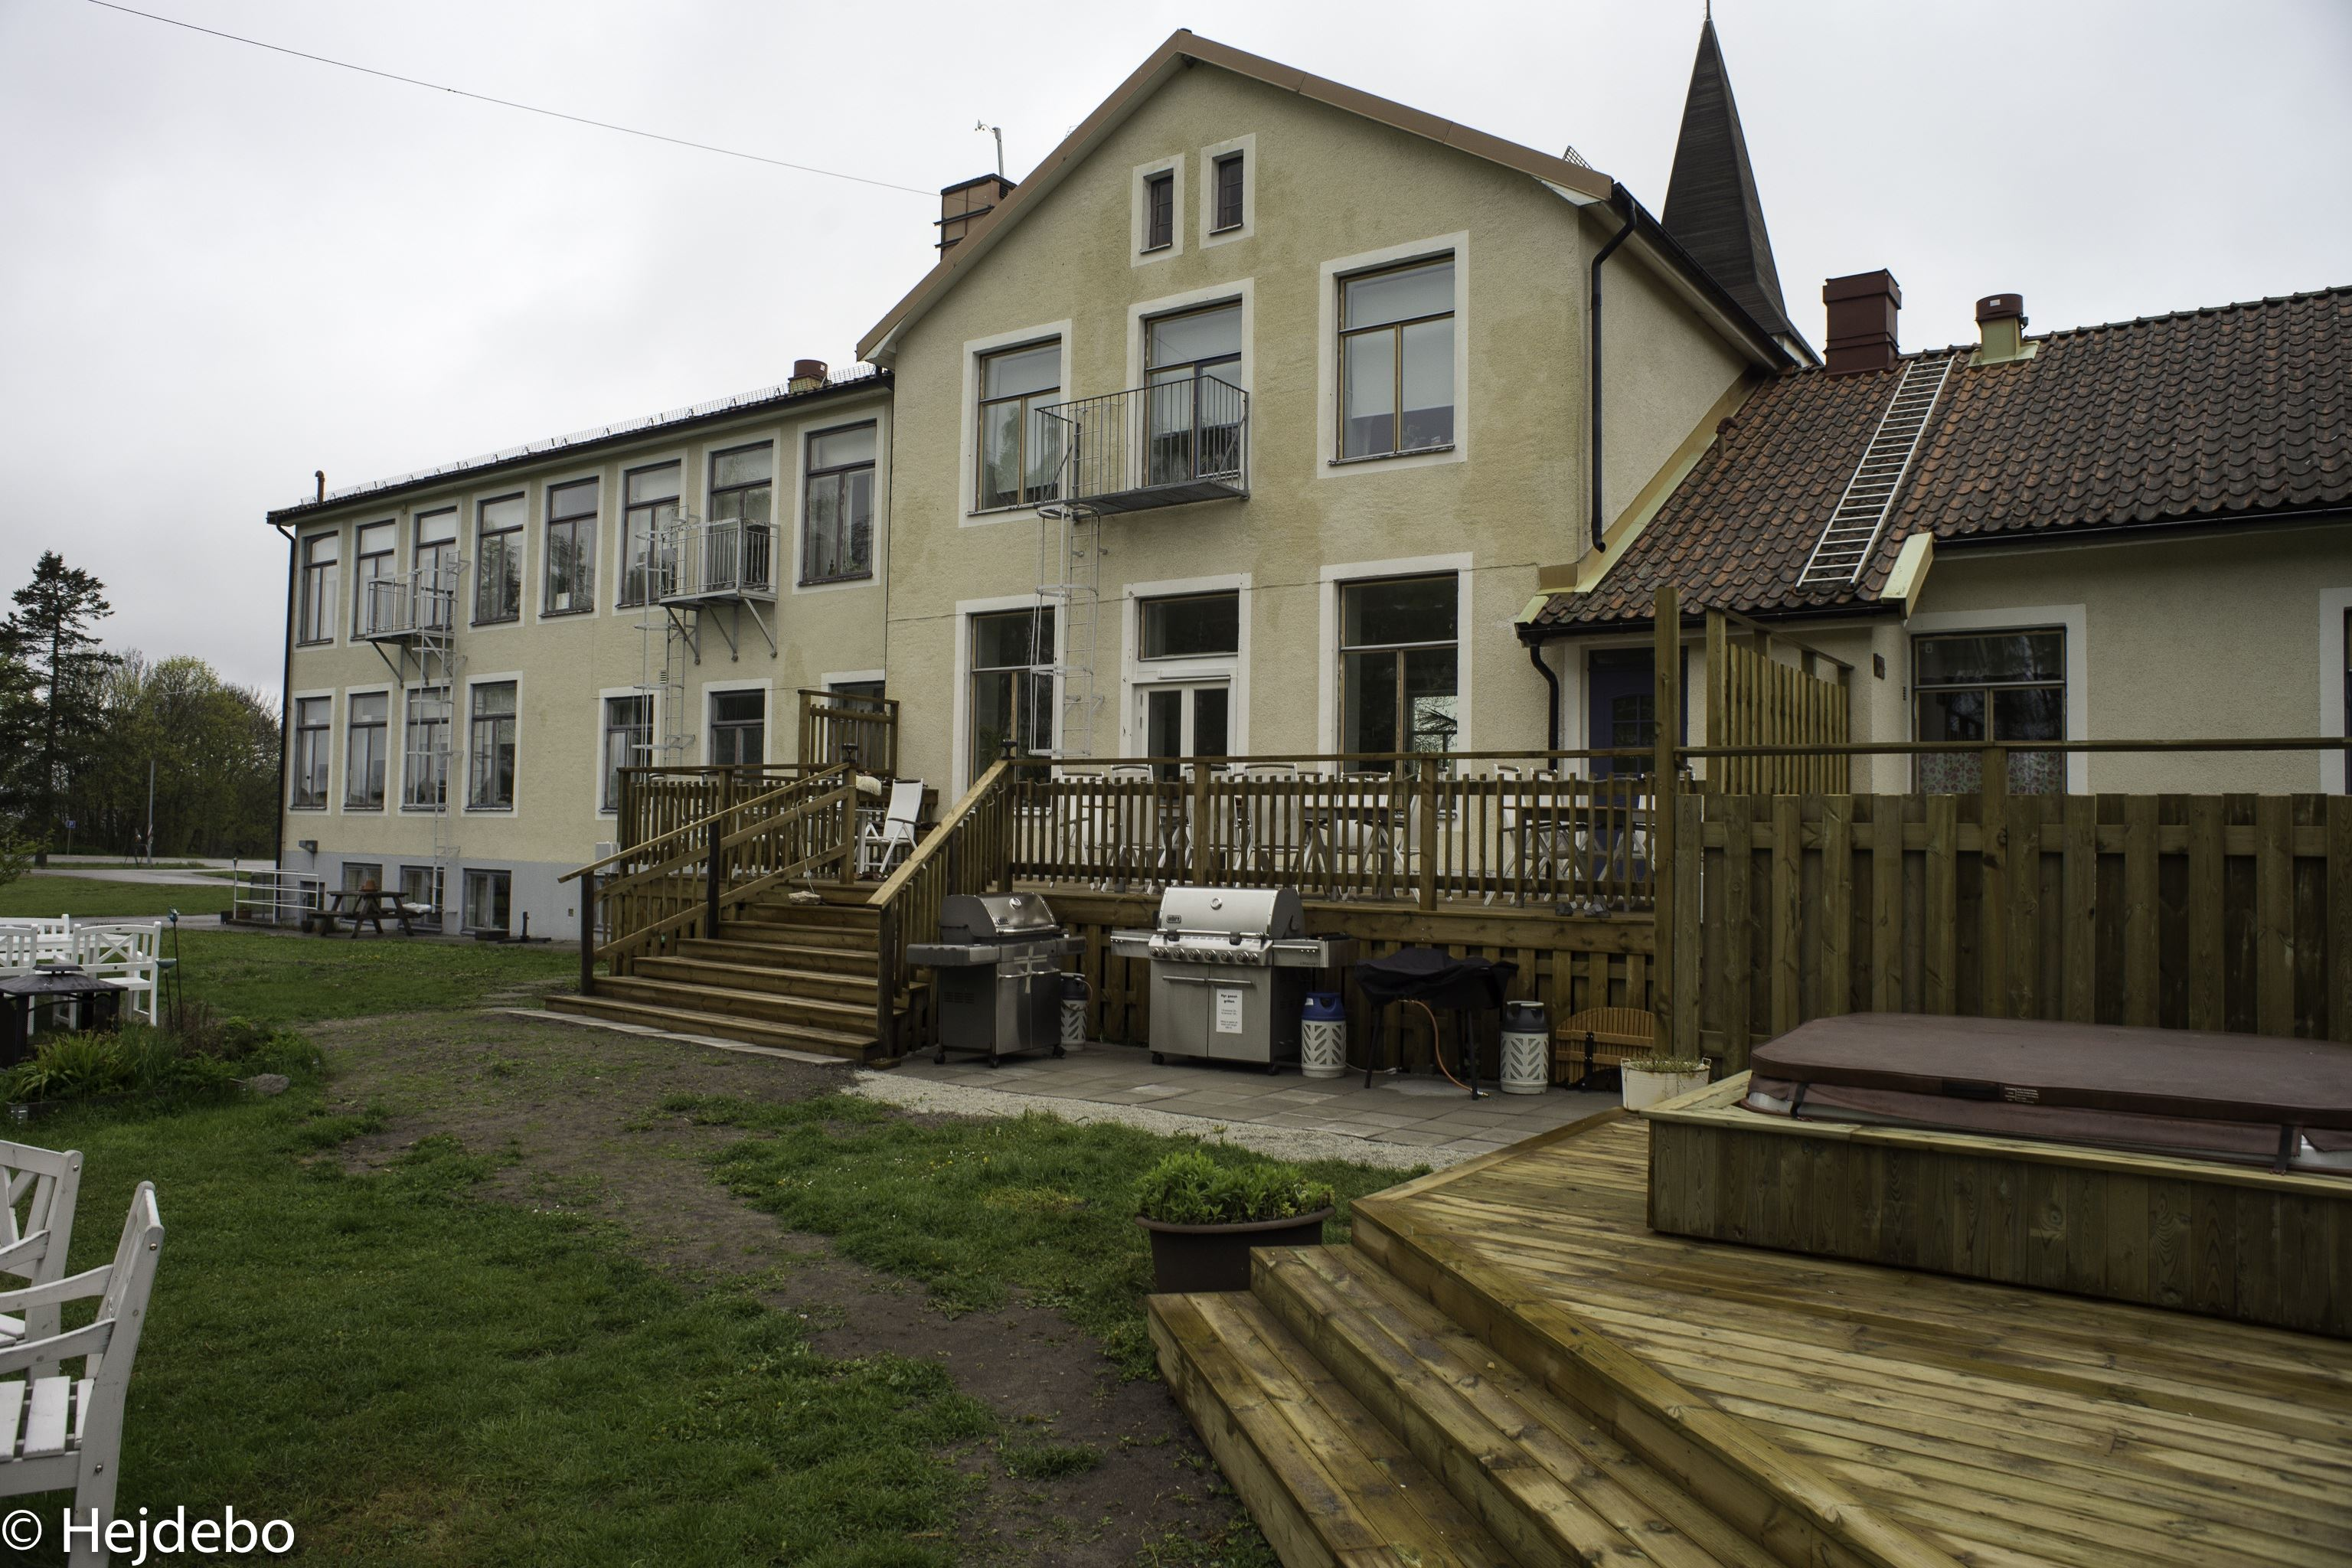 Hejdebo Jugendherberge und Pensionat